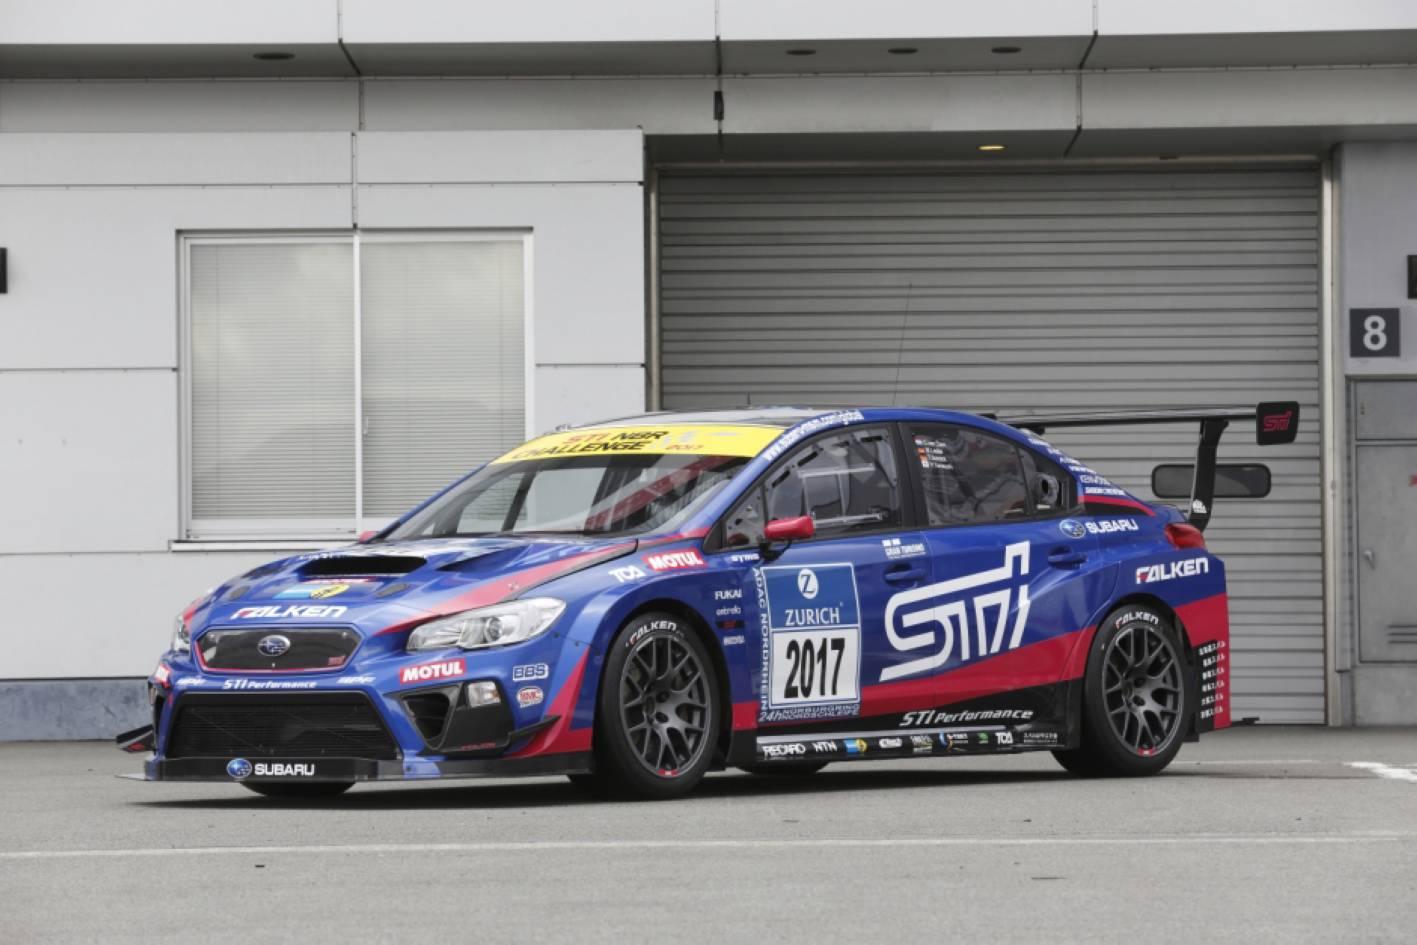 Subaru Wrx Sti Aiming For Third N 252 Rburgring 24h Race